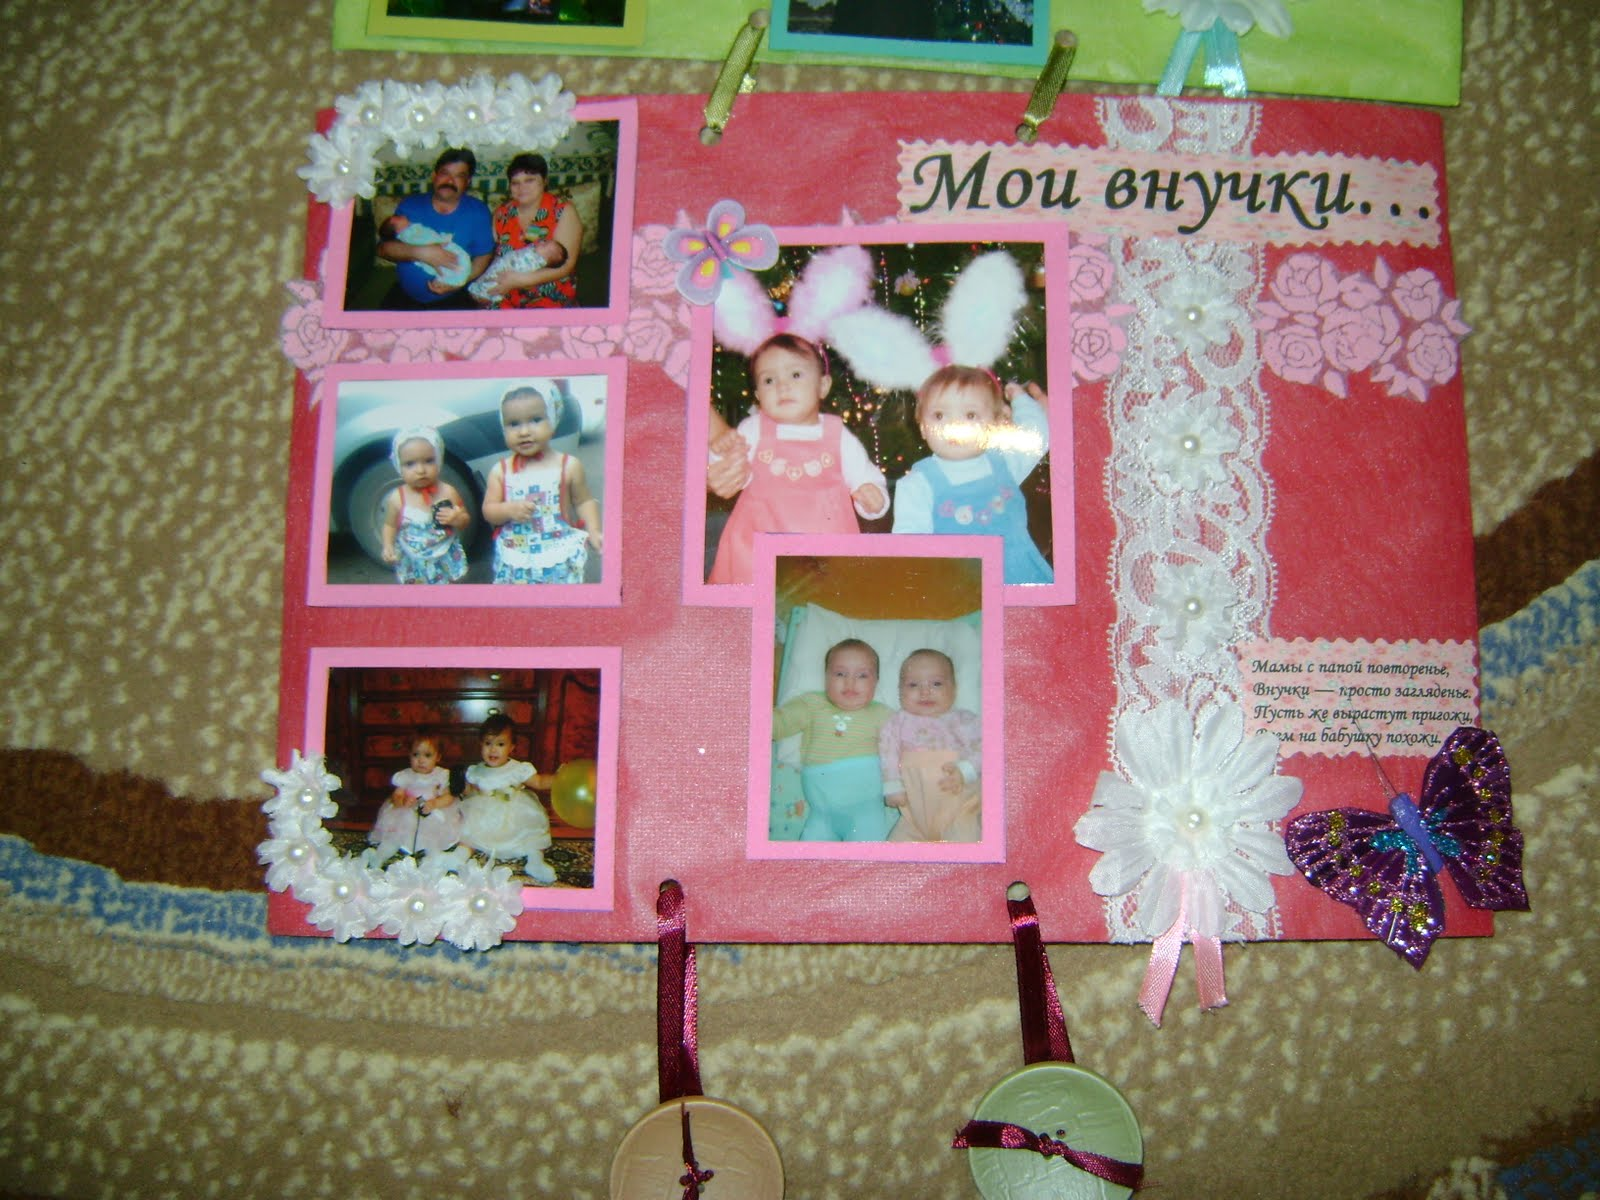 Подарок маме на 60 лет от дочери своими руками 38